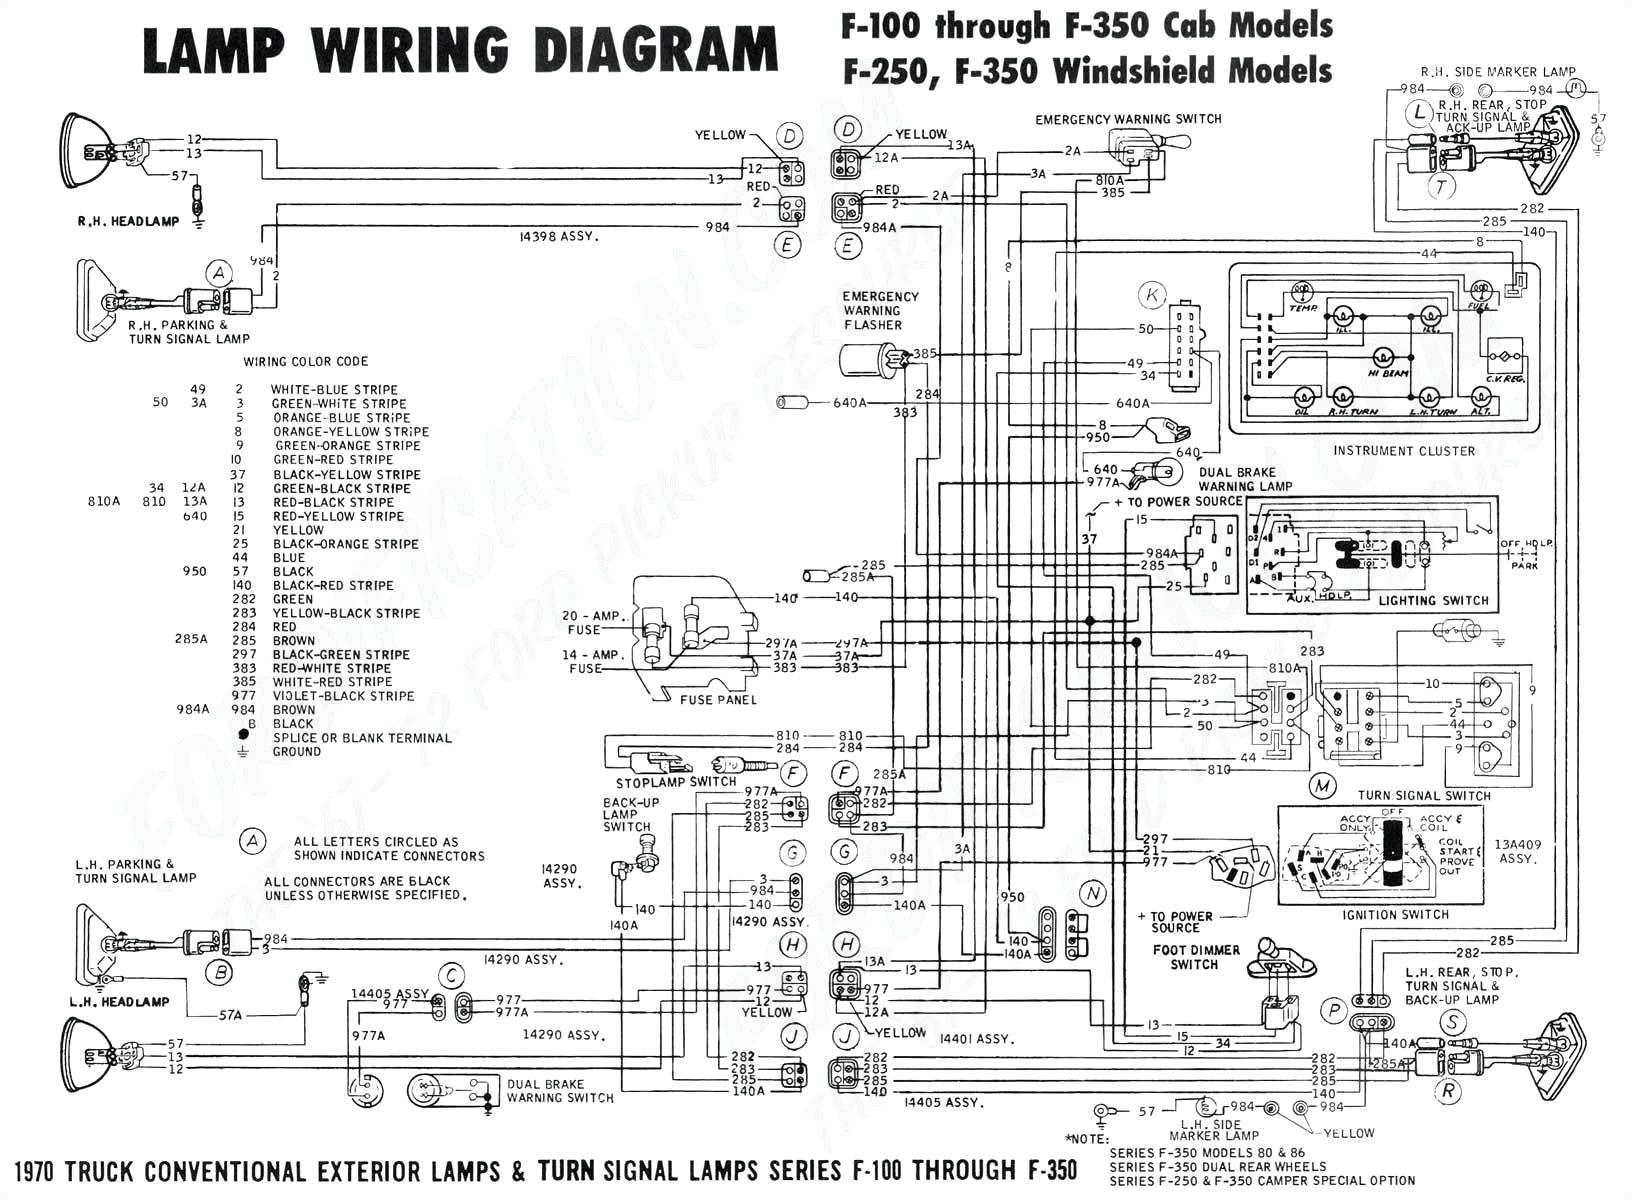 2000 dodge durango turn signal flasher location free download wiring 2000 dodge durango map sensor location free download wiring